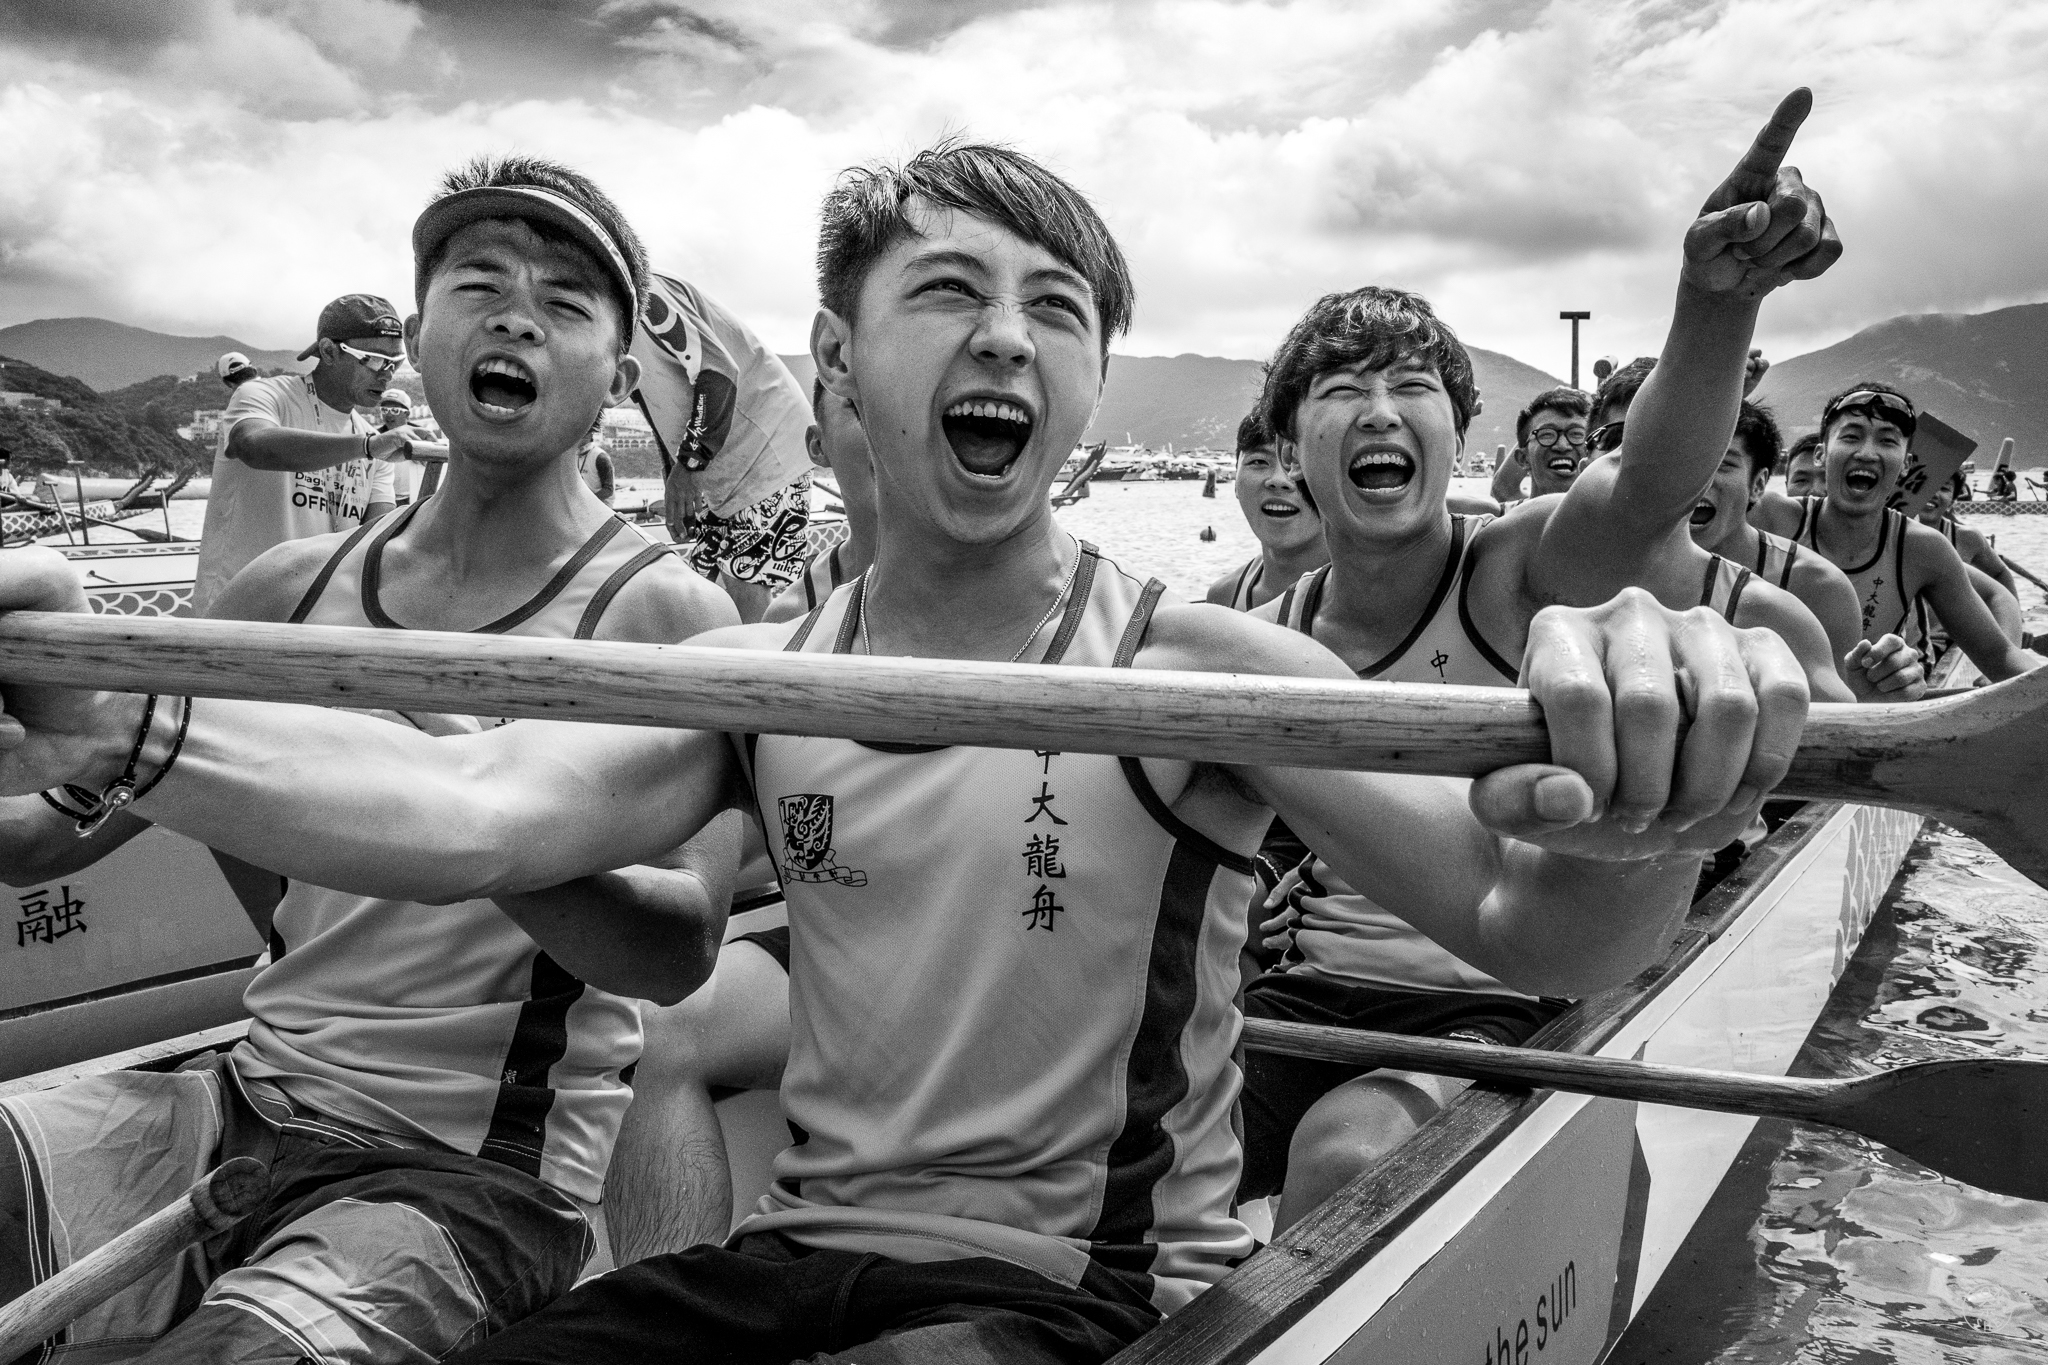 """Team Spirit"".  A Dragonboat Festival Race team from Hong Kong University doing what they do best. Hong Kong, China. June, 2016. © Jon She.Leica Q (Typ 116), Leica Summilux-M 28mm ASPH."